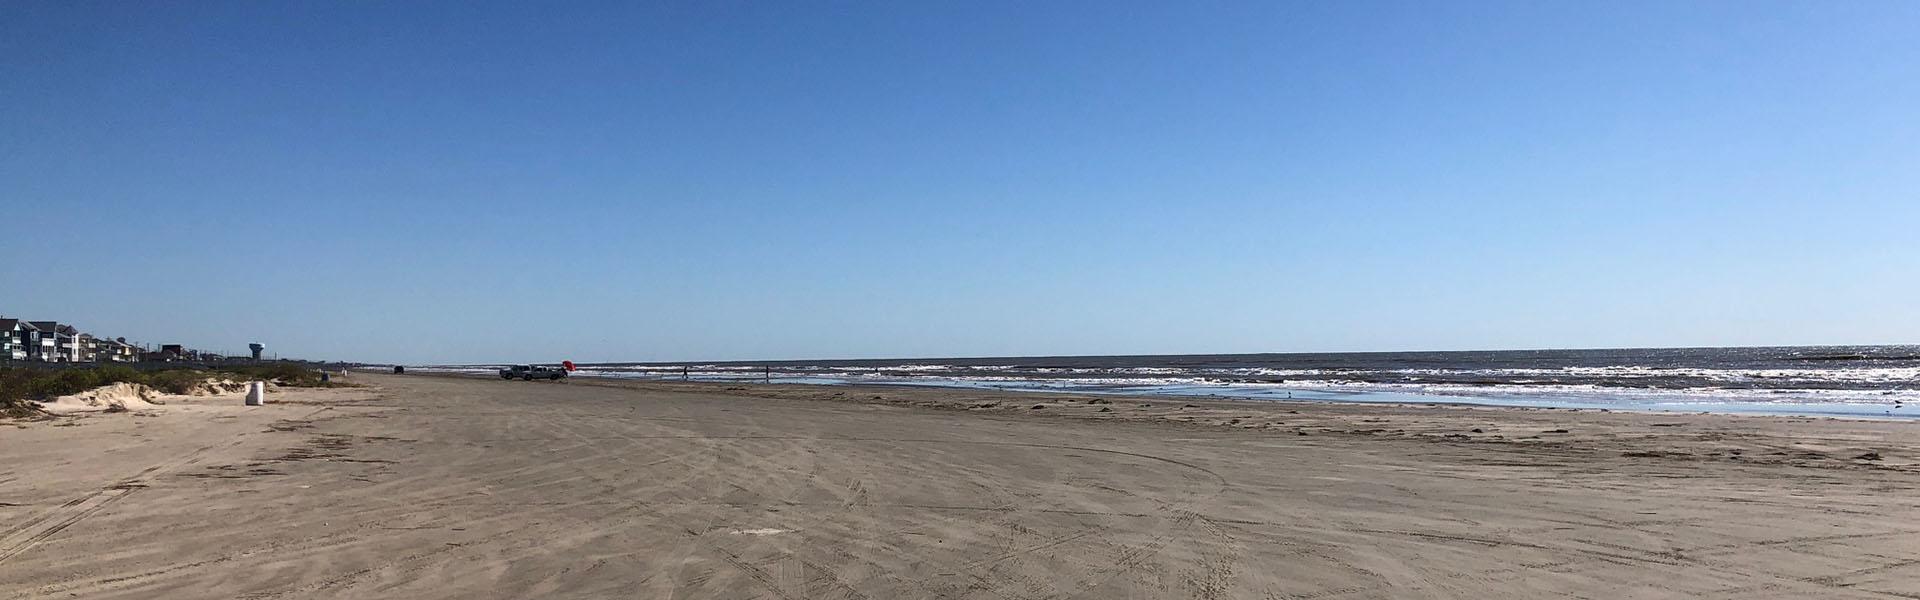 Beach Access Point 36 at Salt Cedar Drive